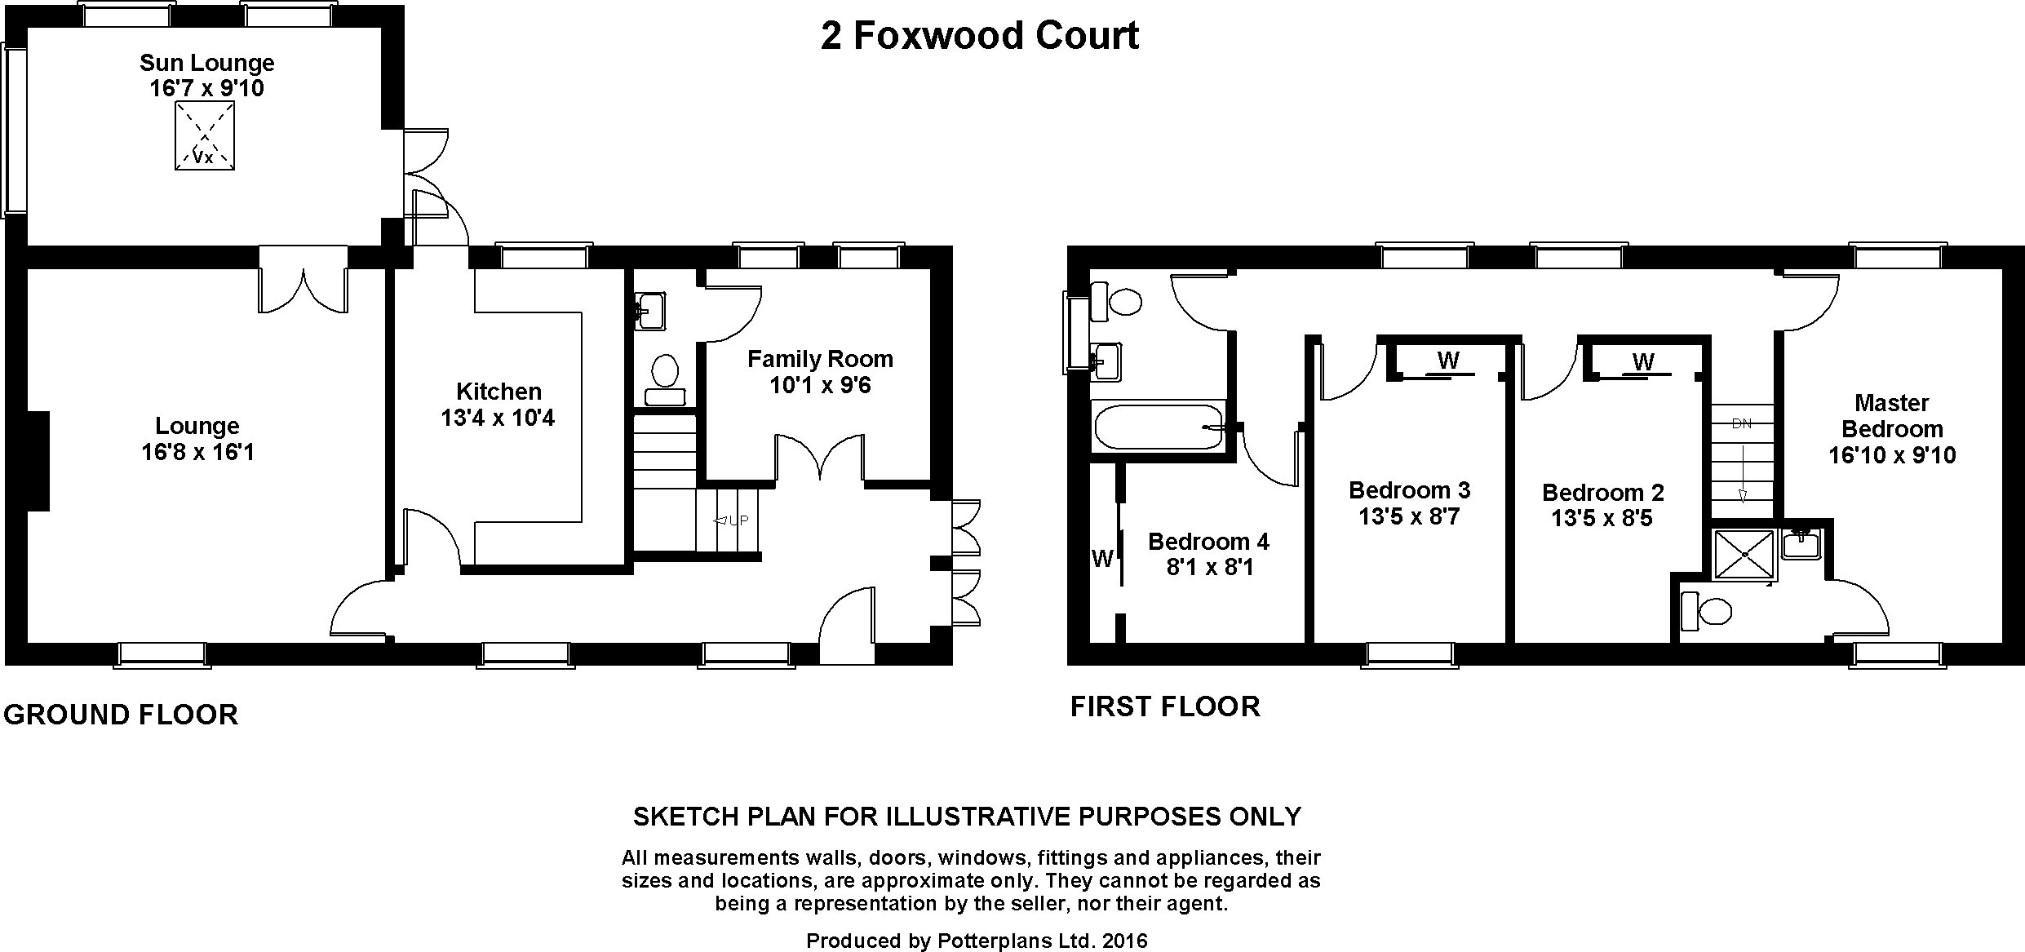 Foxwoods Floor Plan   Mgm Grand Floor Plan Las Vegas Mgm